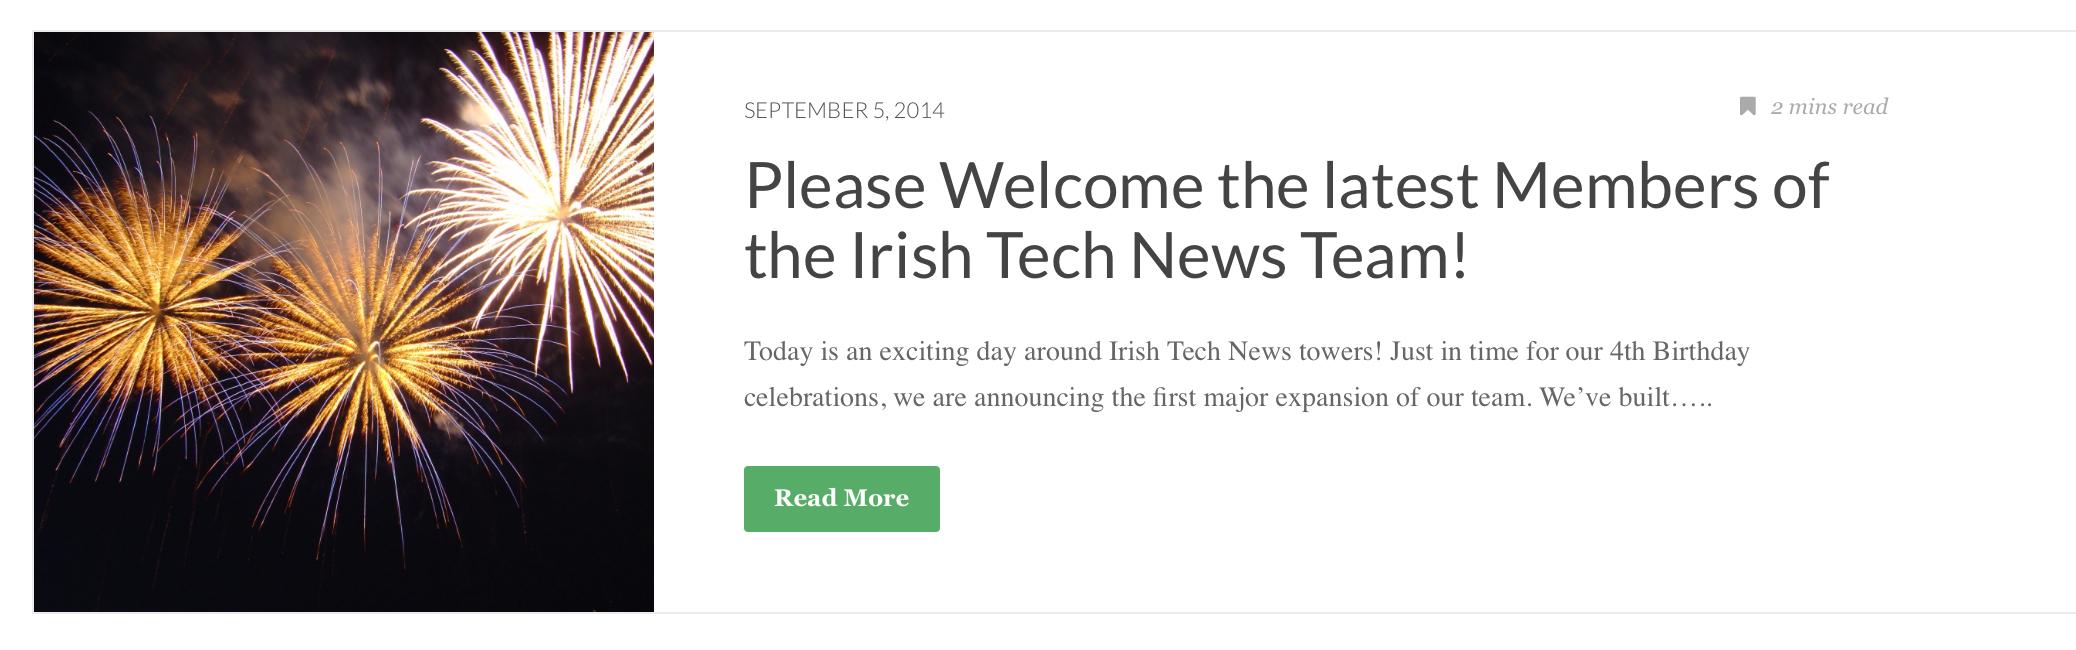 Irish_Tech_News___Irish_Tech_News.jpg